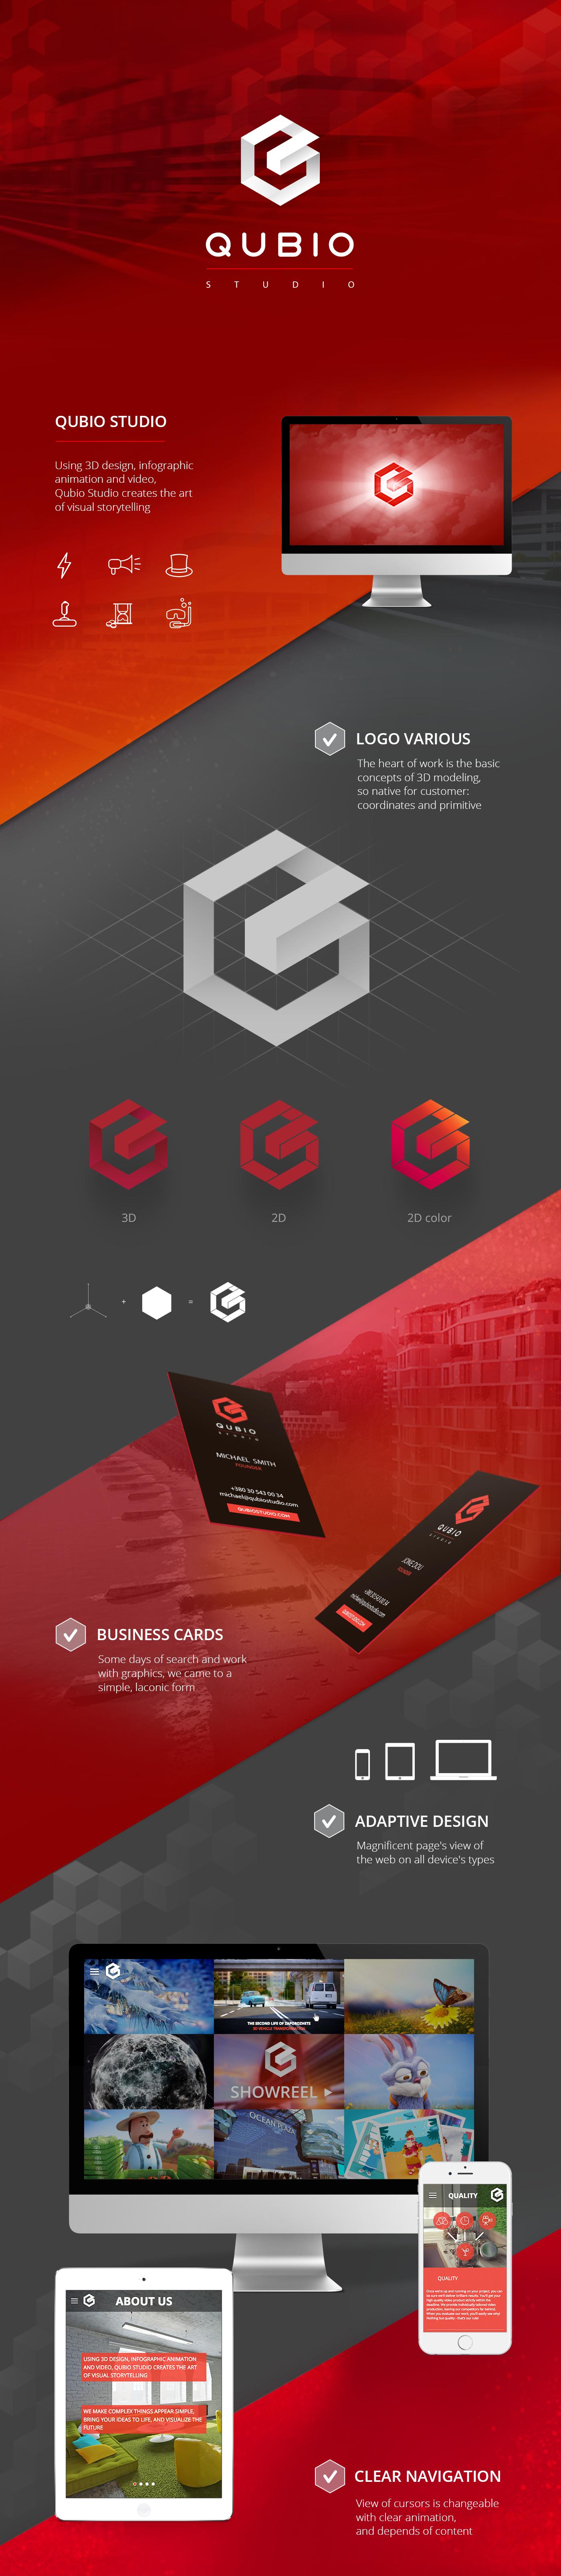 Qubio logo Responsive 3D motion digital Web